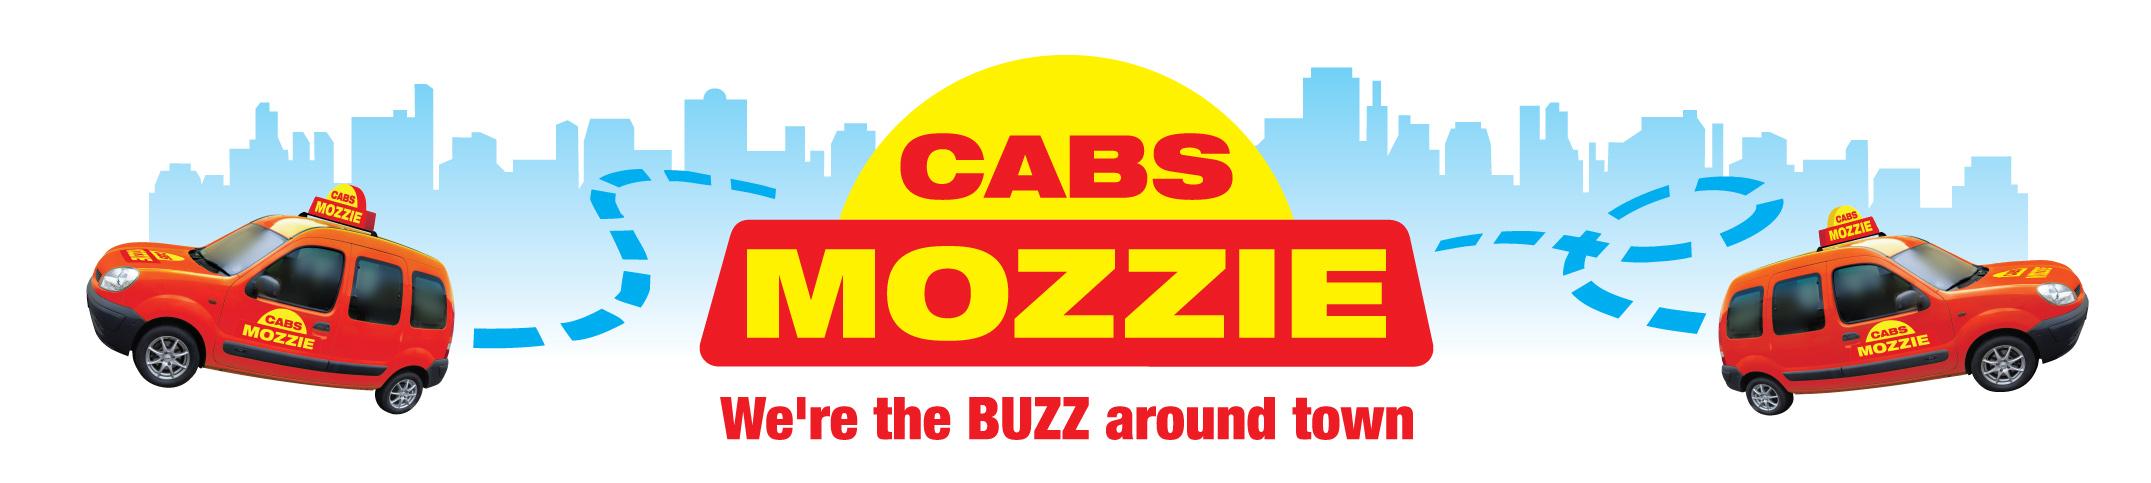 Mozzie Cabs